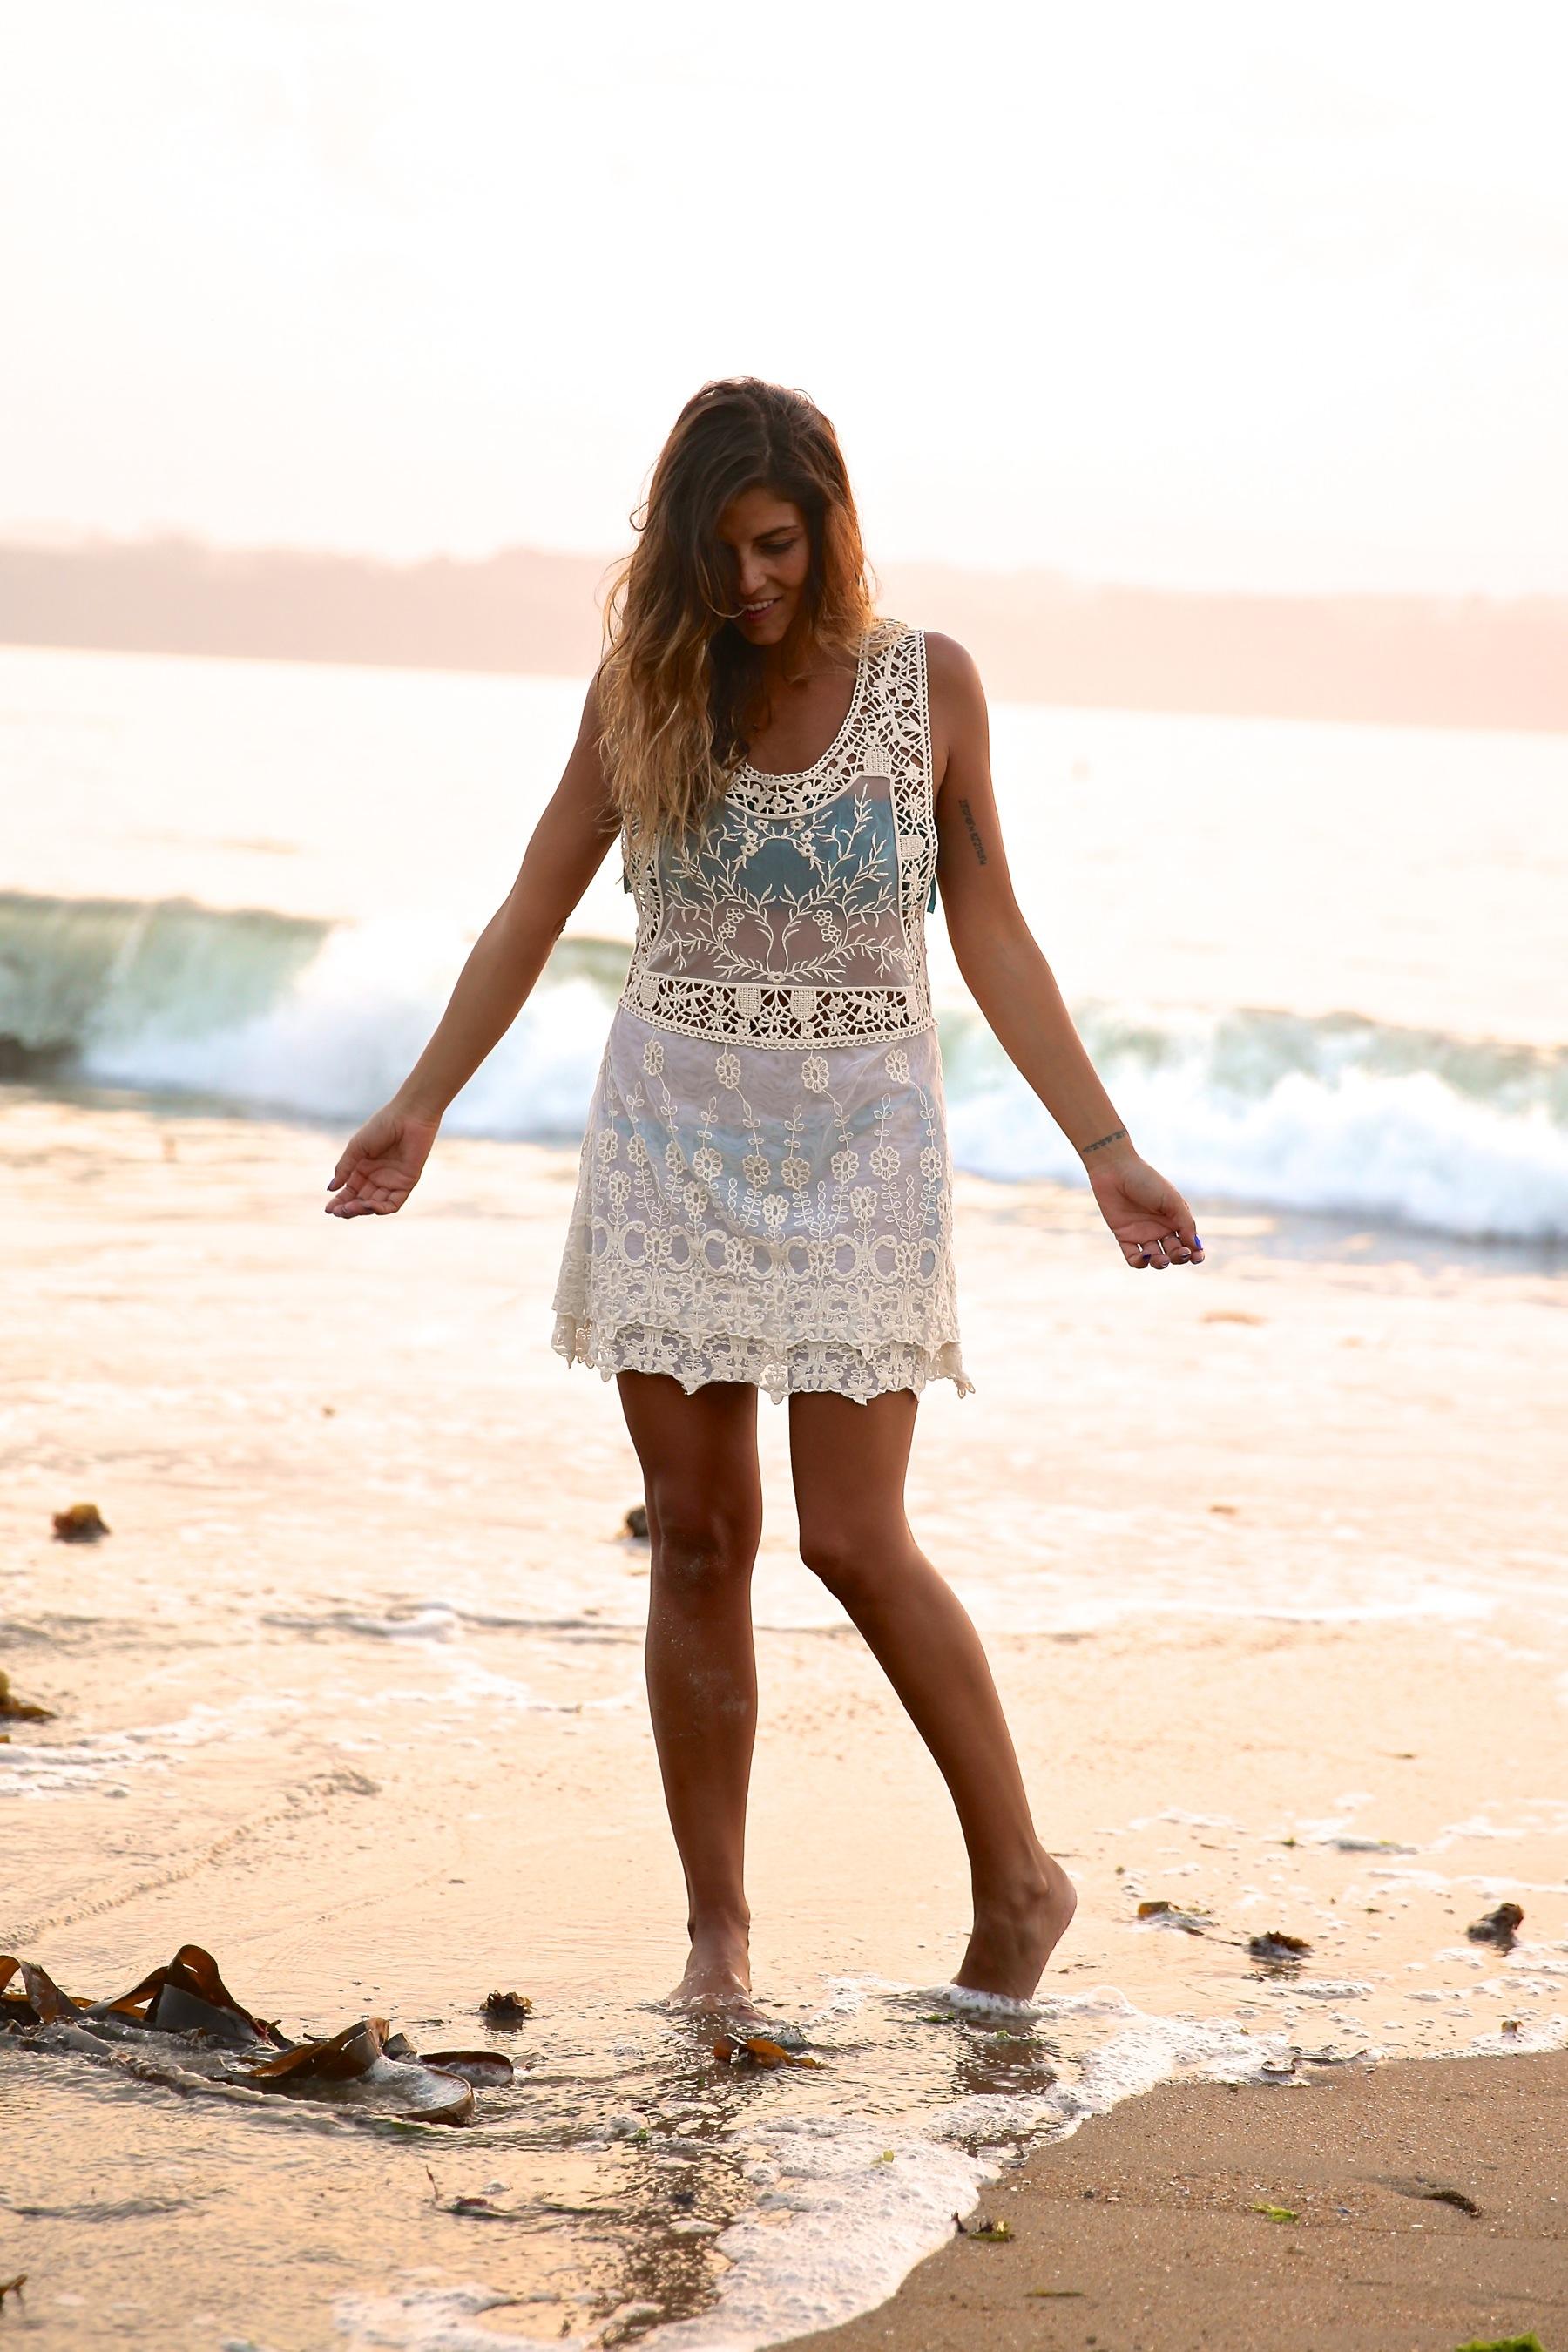 trendy_taste-look-outfit-street_style-boho-ootd-blog-blogger-fashion_spain-moda_españa-verano-crochet-vestido-bikini-hippie-dress-galicia-sunset-puesta_de_sol-piz_buin-9